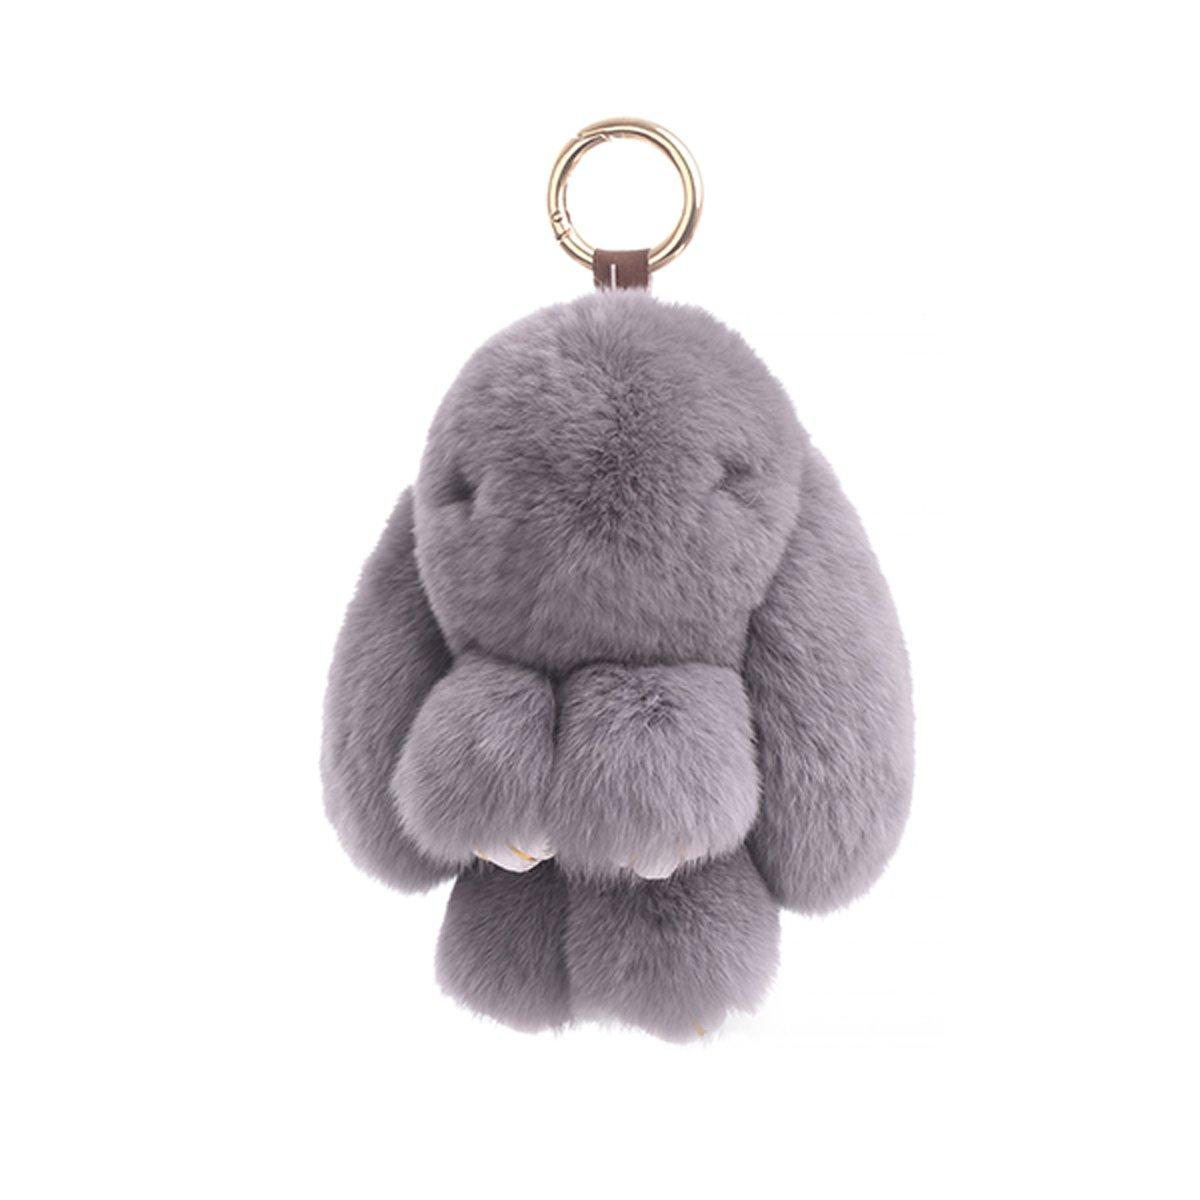 27 Color Soft Cute Pom Pom Ball Doll Pendant Plush Charms IKEPOD Rex Rabbit Fur Keychain Fluffy Real Bunny Keyring